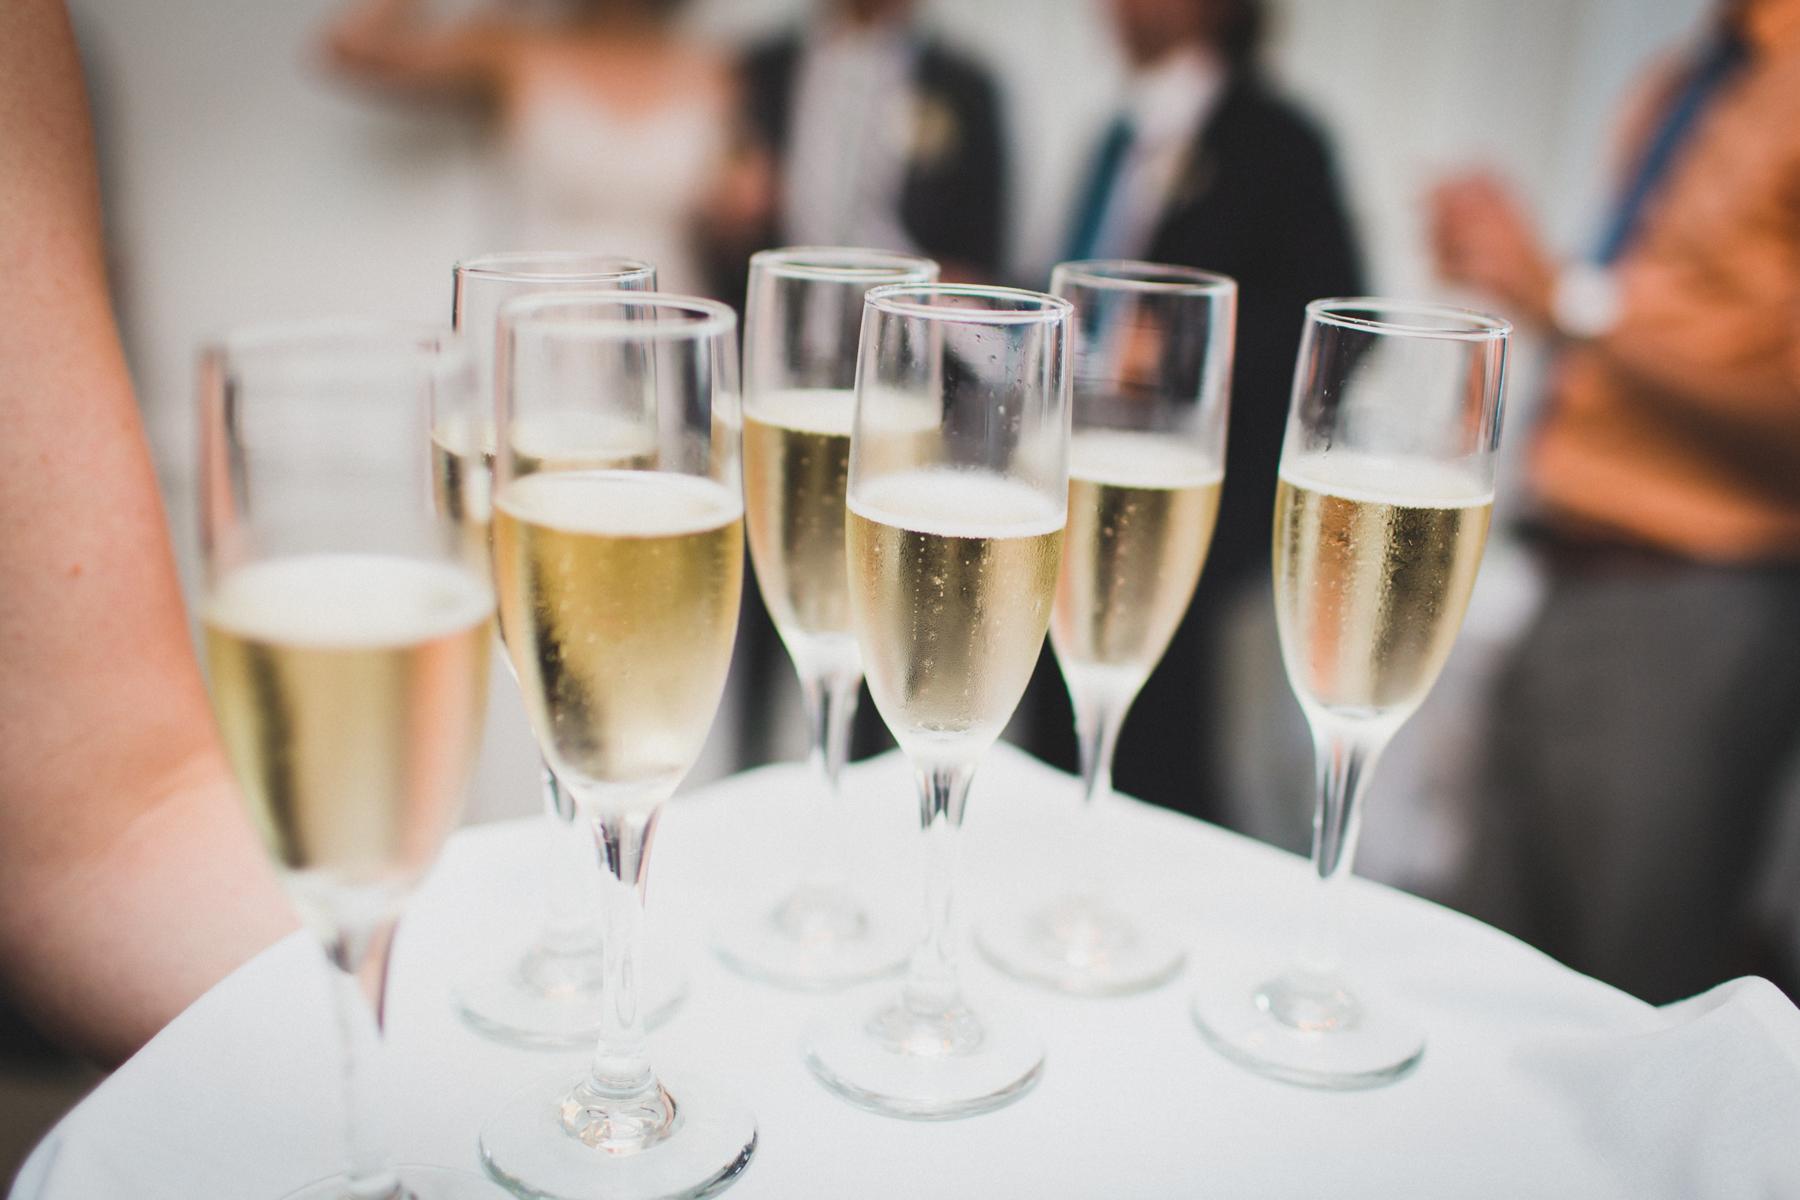 ICI-Restaurant-Fort-Greene-Brooklyn-Intimate-Documentary-Wedding-Photography-Elvira-Kalviste-71.jpg